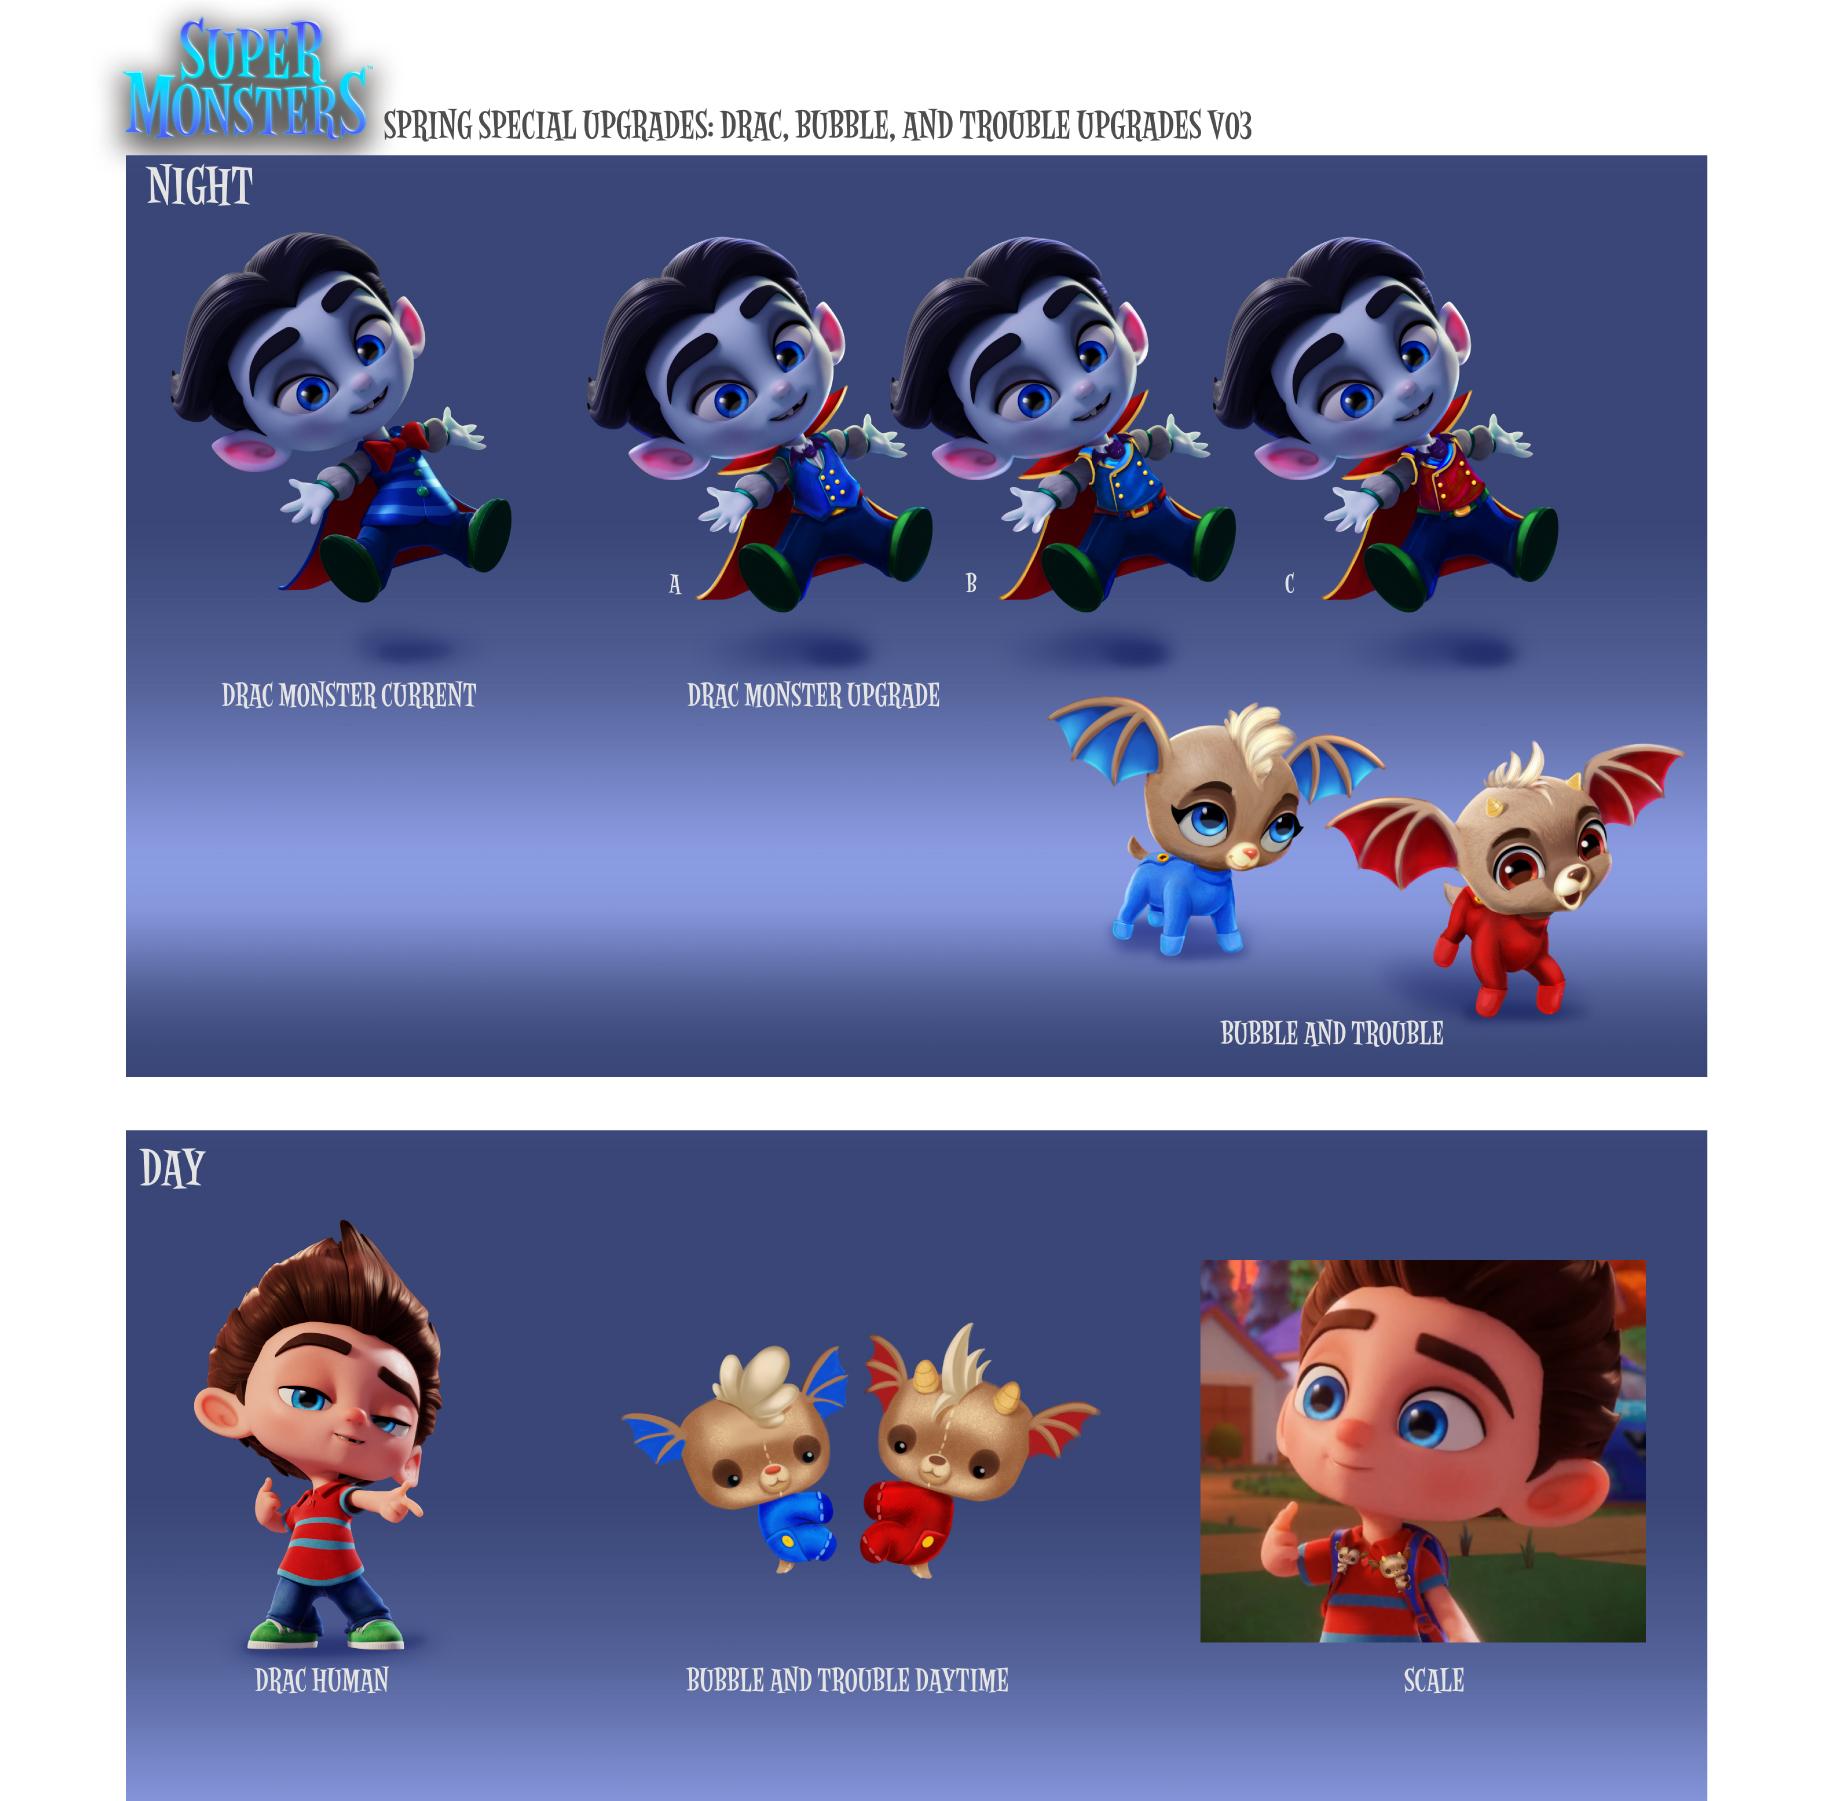 Super-Monsters-10.jpg